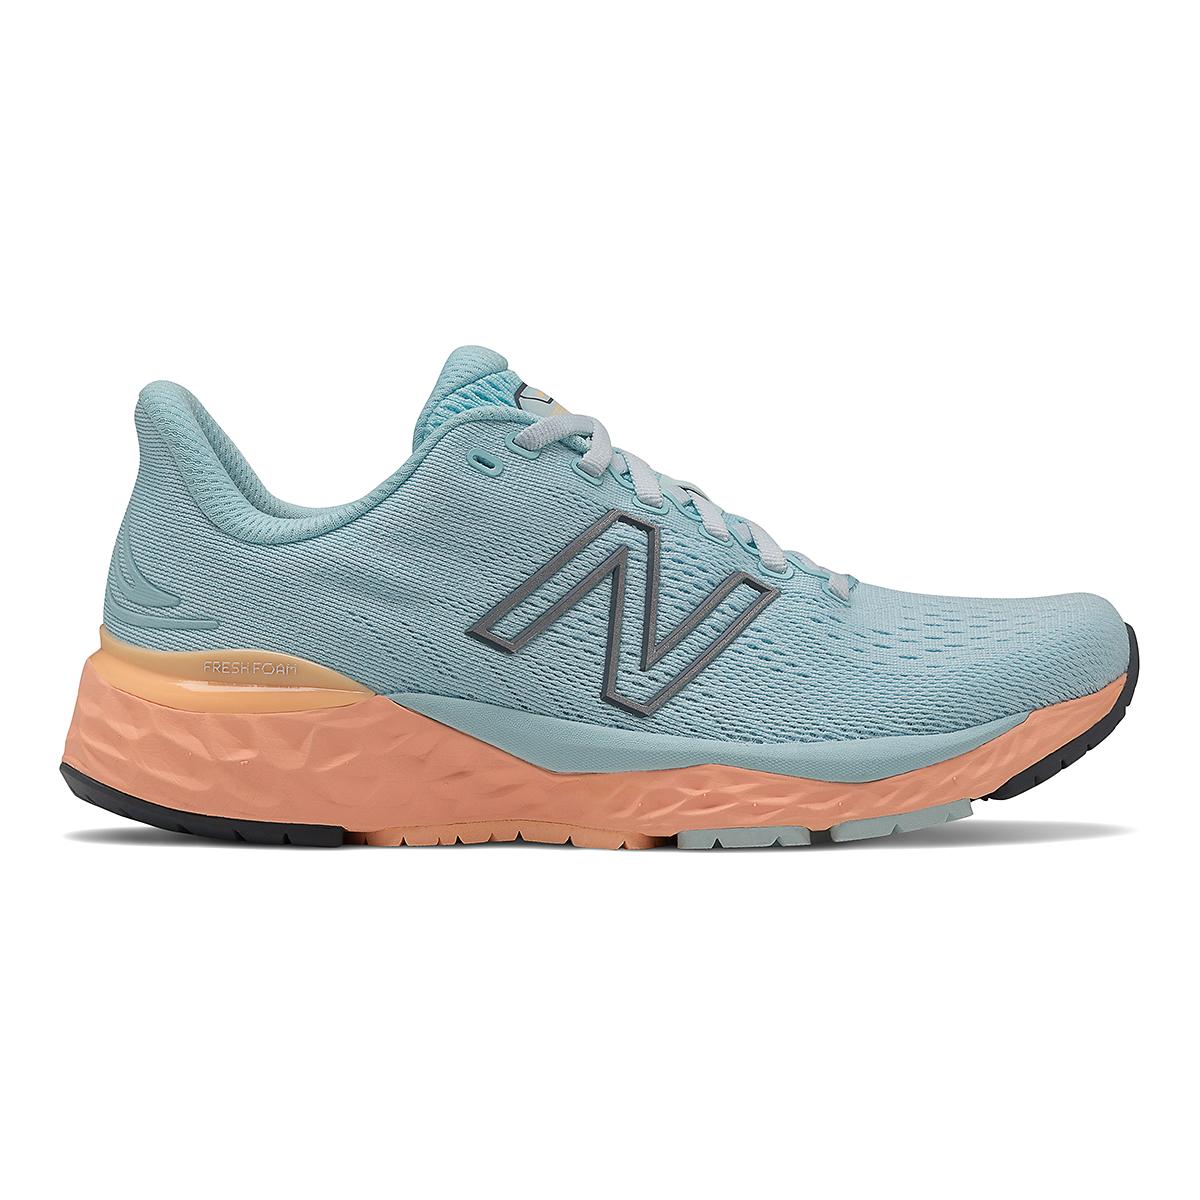 Women's New Balance 880V11 Running Shoe - Color: Pale Blue Chill/Light Mango - Size: 5 - Width: Narrow, Pale Blue Chill/Light Mango, large, image 1